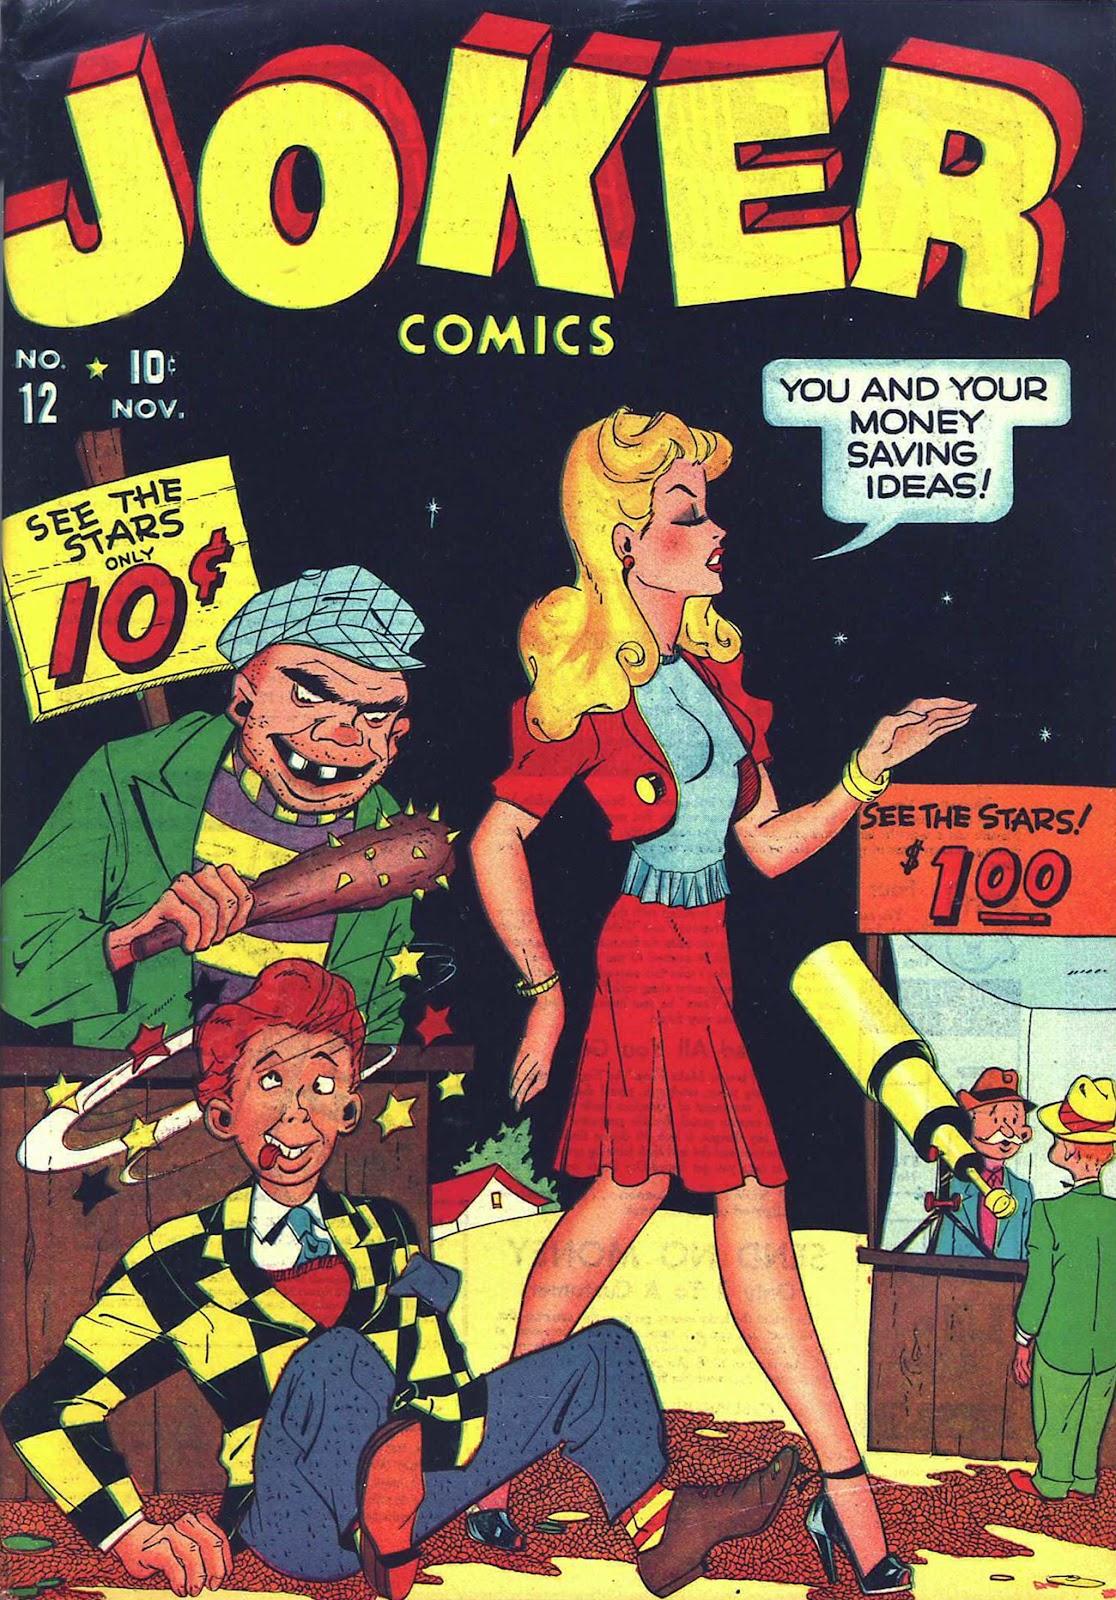 Read online Joker Comics comic -  Issue #12 - 1